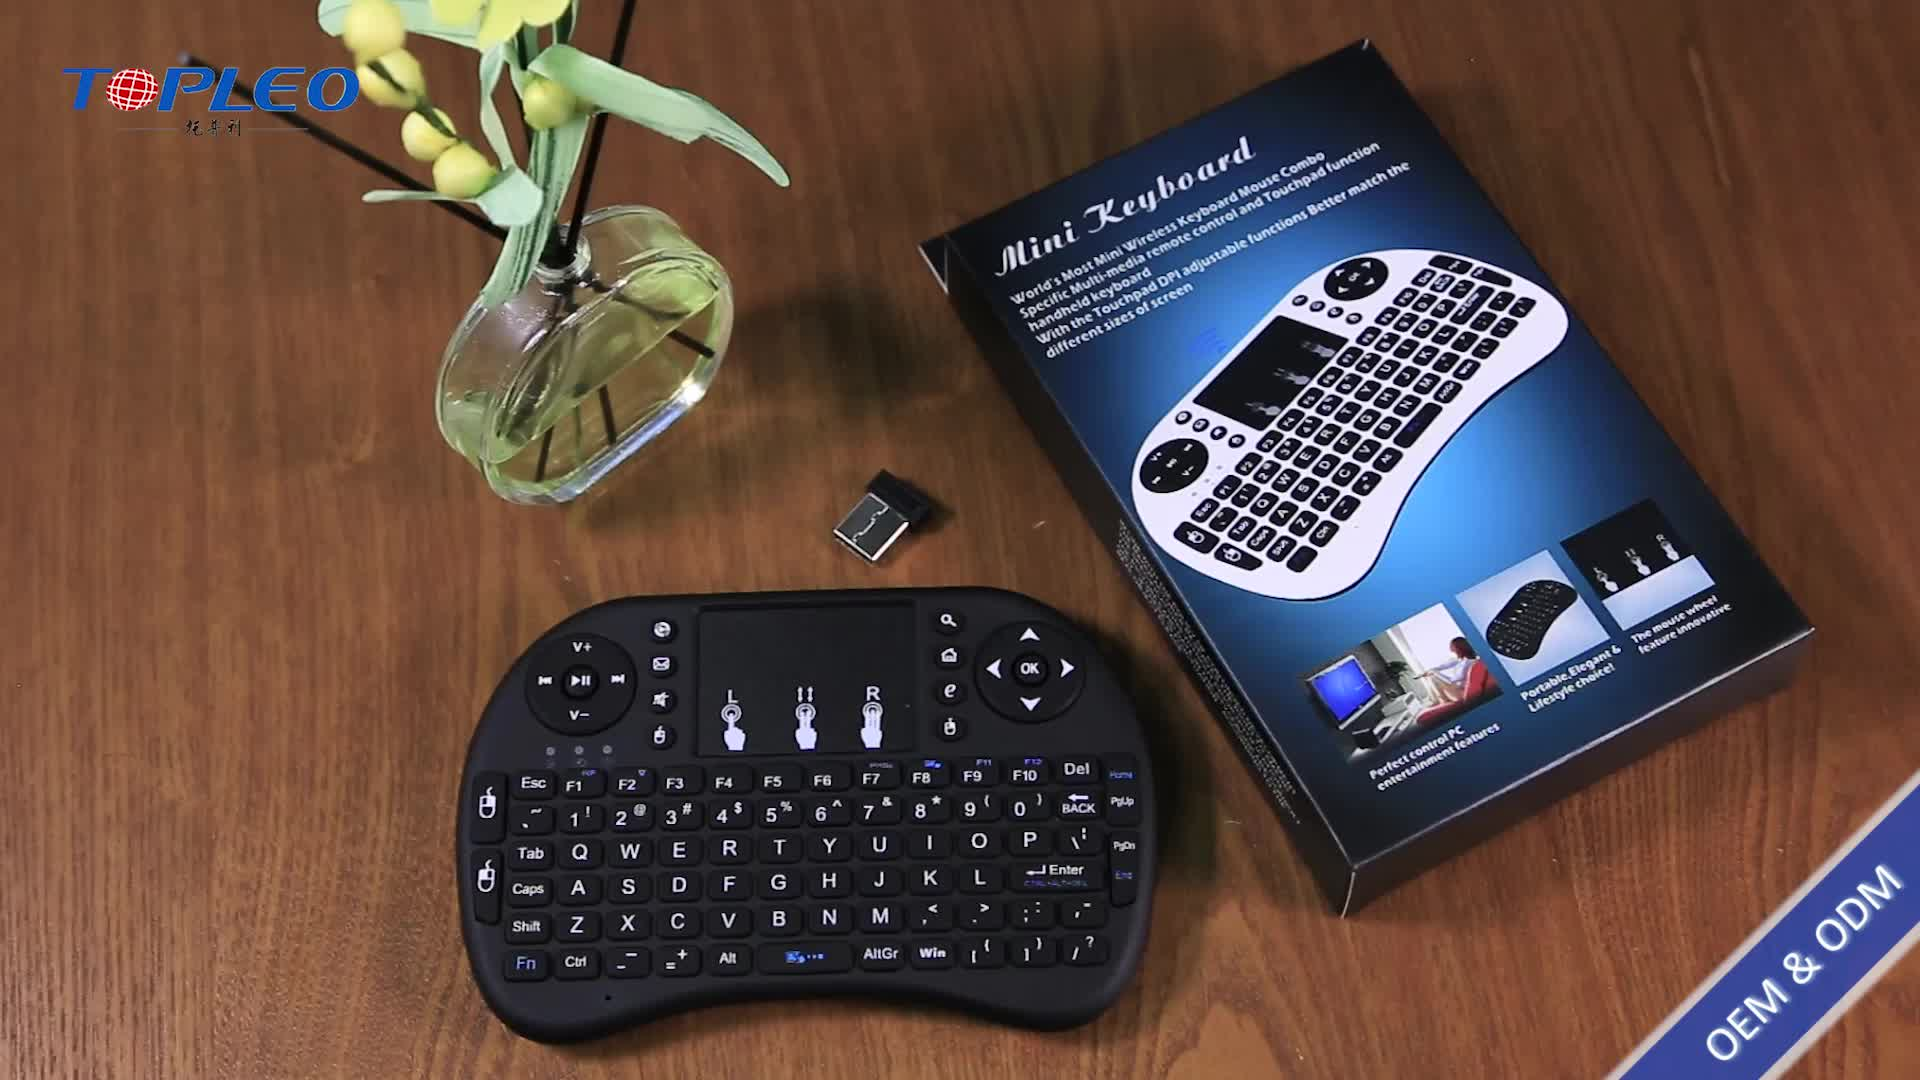 Teknologi terbaru back-light mini keyboard dan mouse nirkabel dengan touch touchpad sensitif